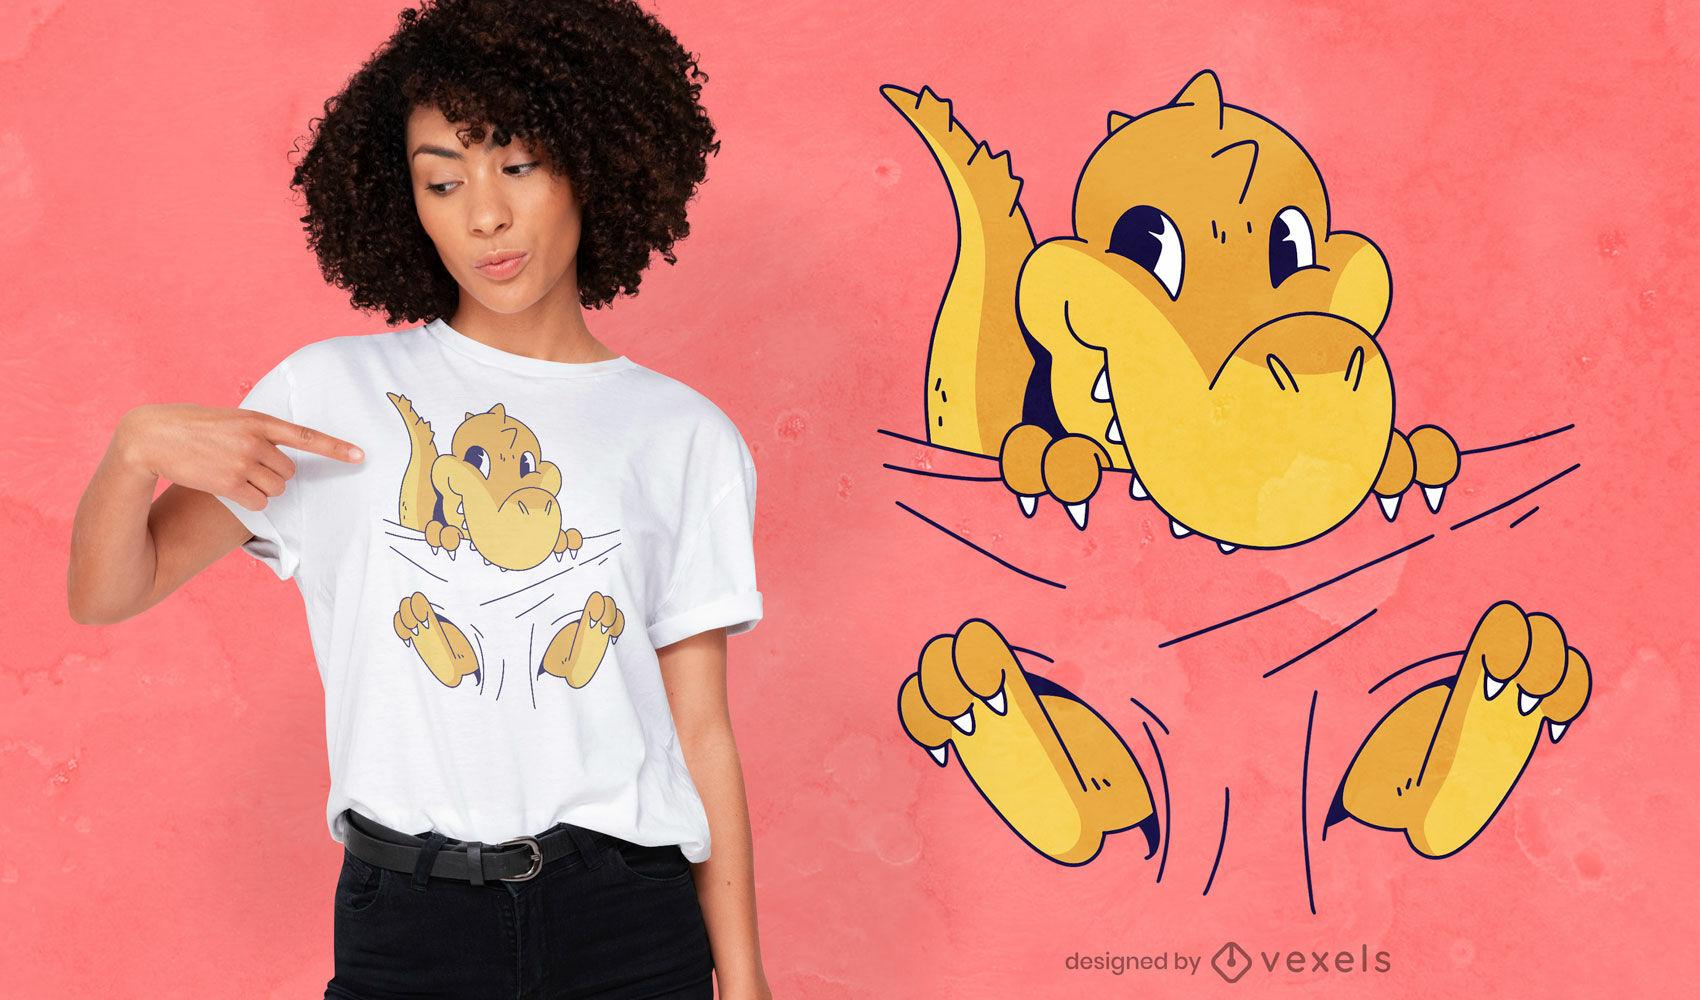 Carrying baby T-rex t-shirt design